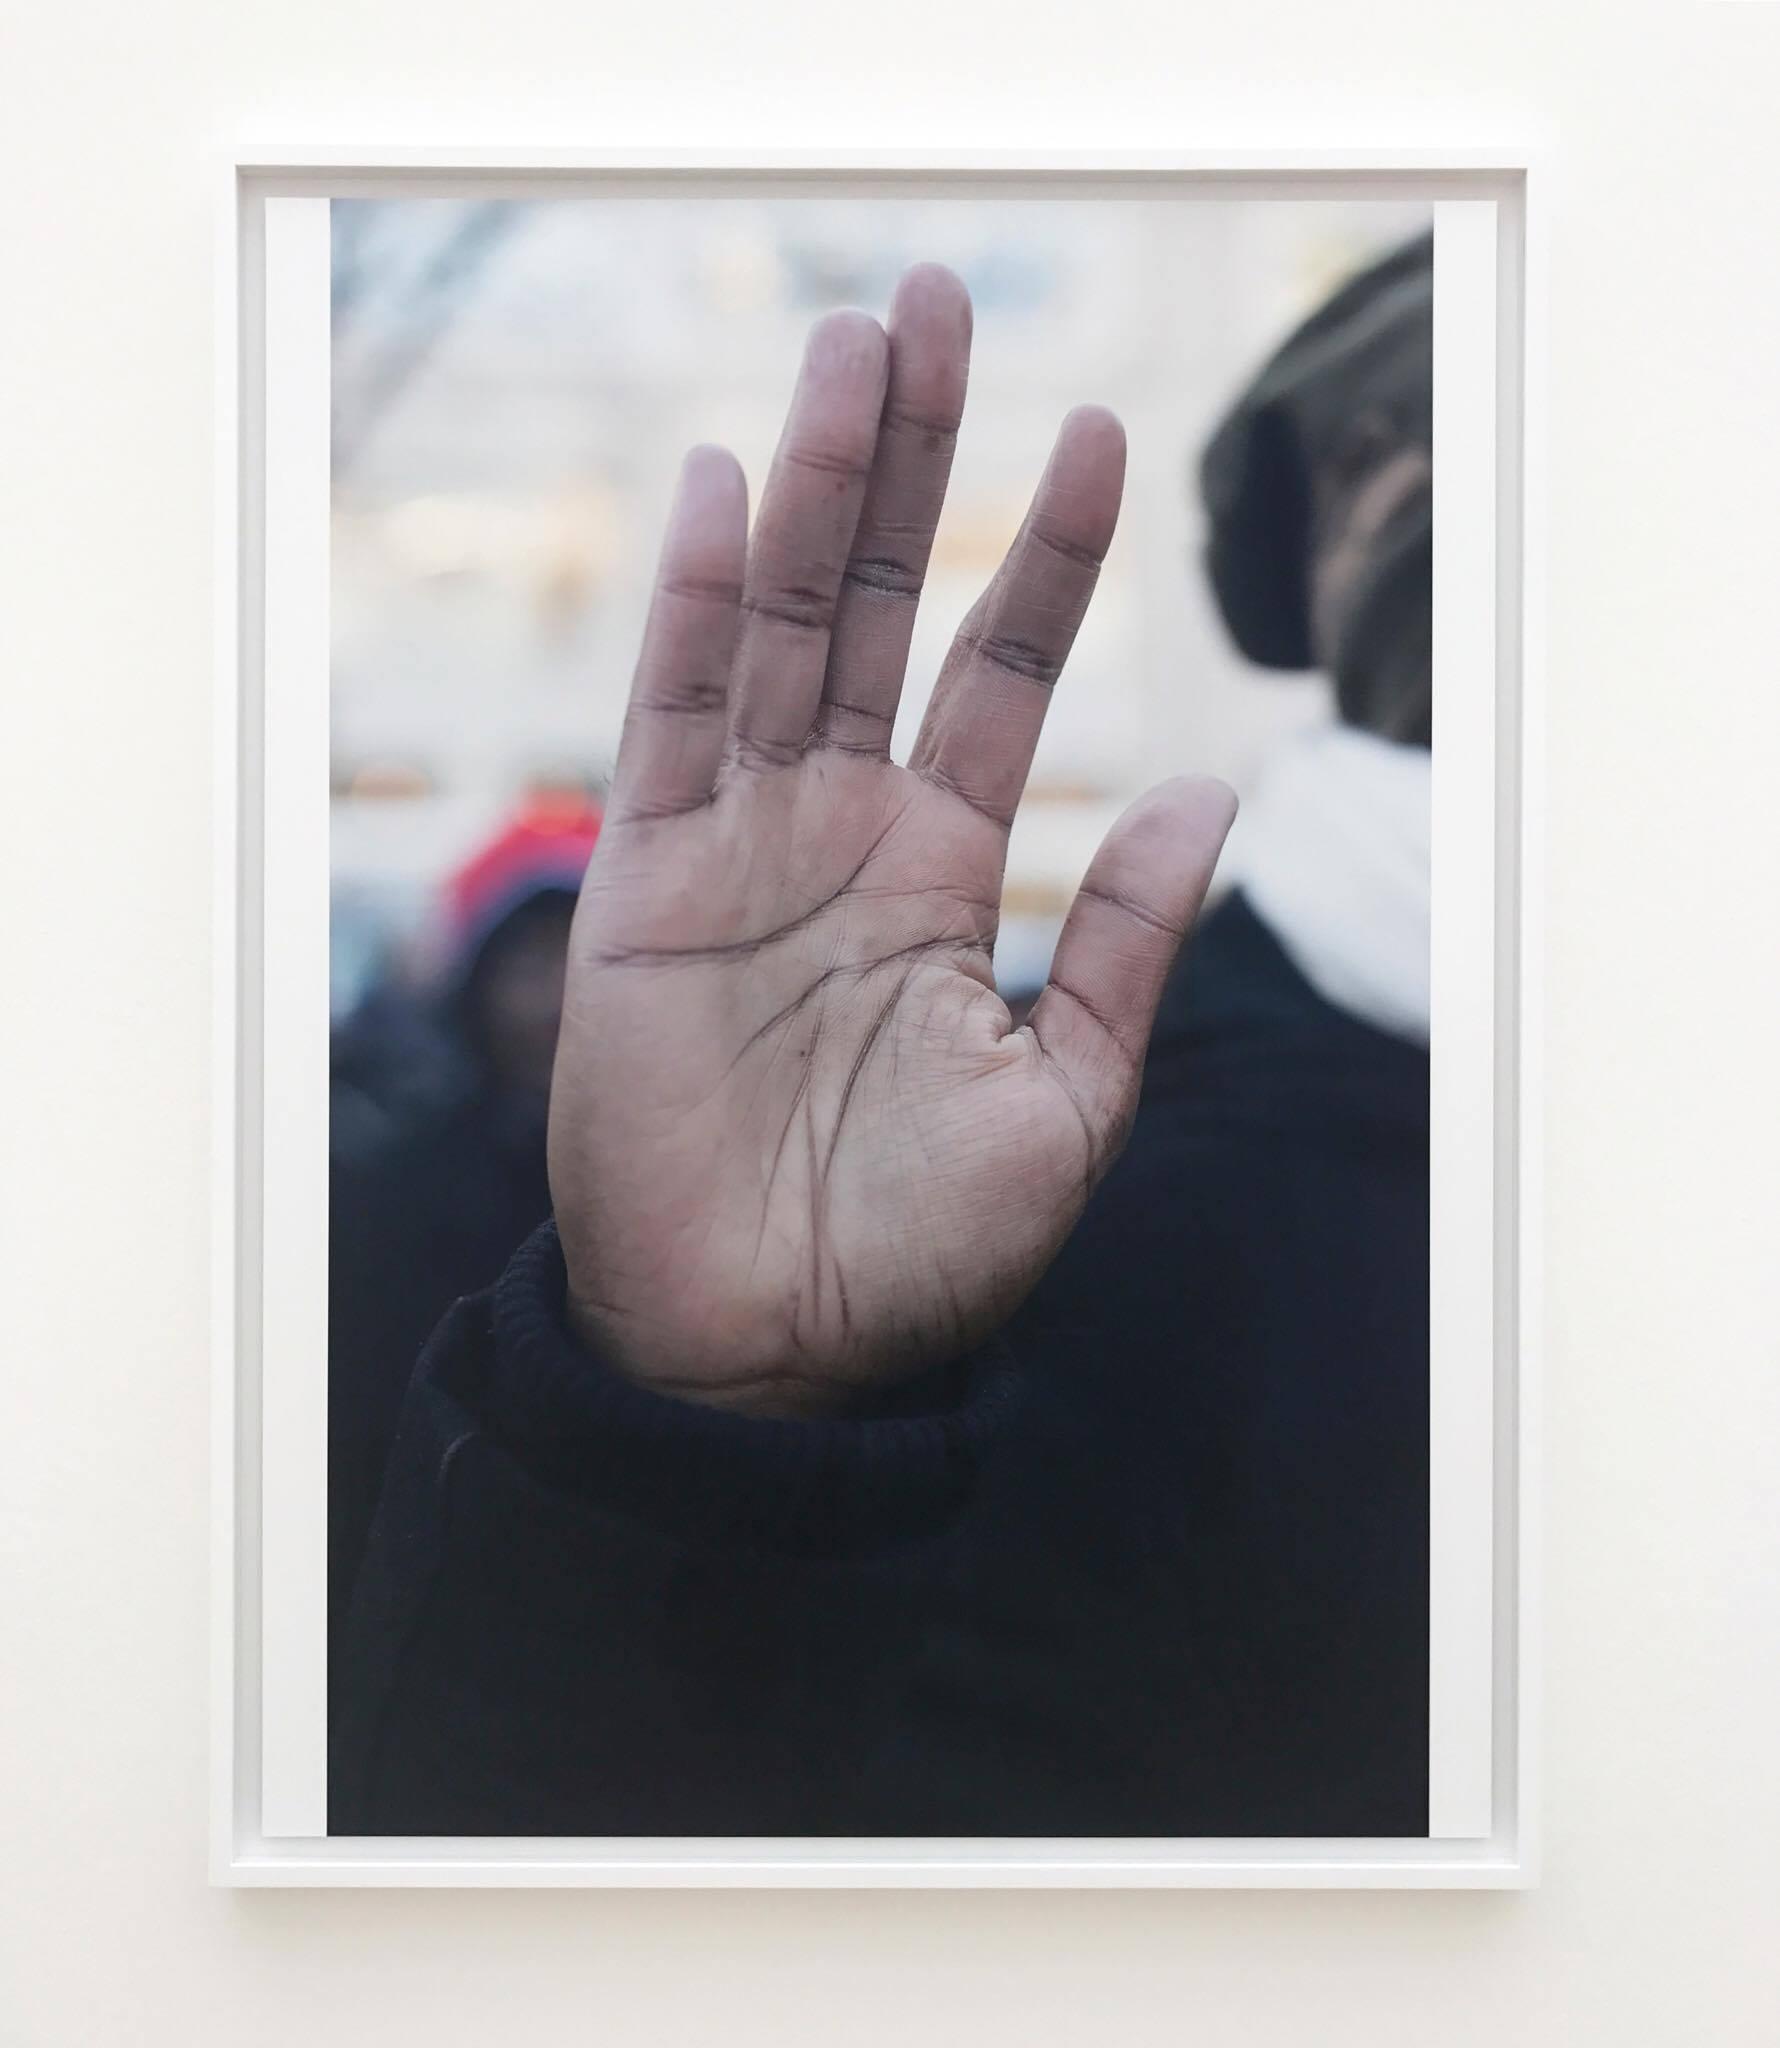 WF, Black Lives Matter protest, Union Square, b (2014)